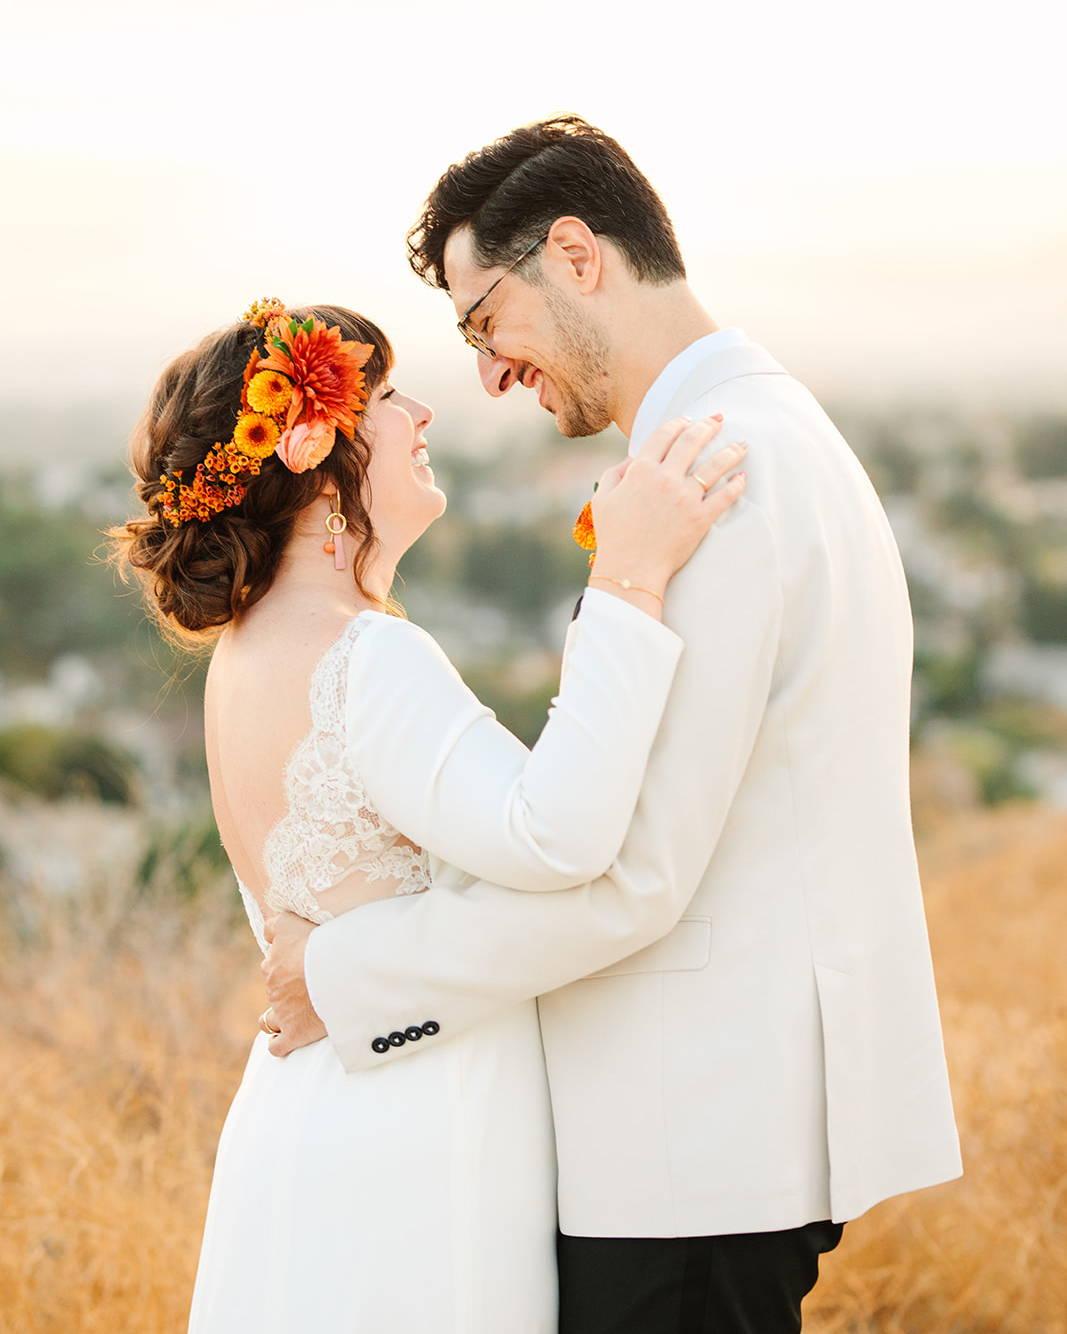 Wedding Edit | Alternative bridal jewellery handmade in the UK by Wolf & Moon